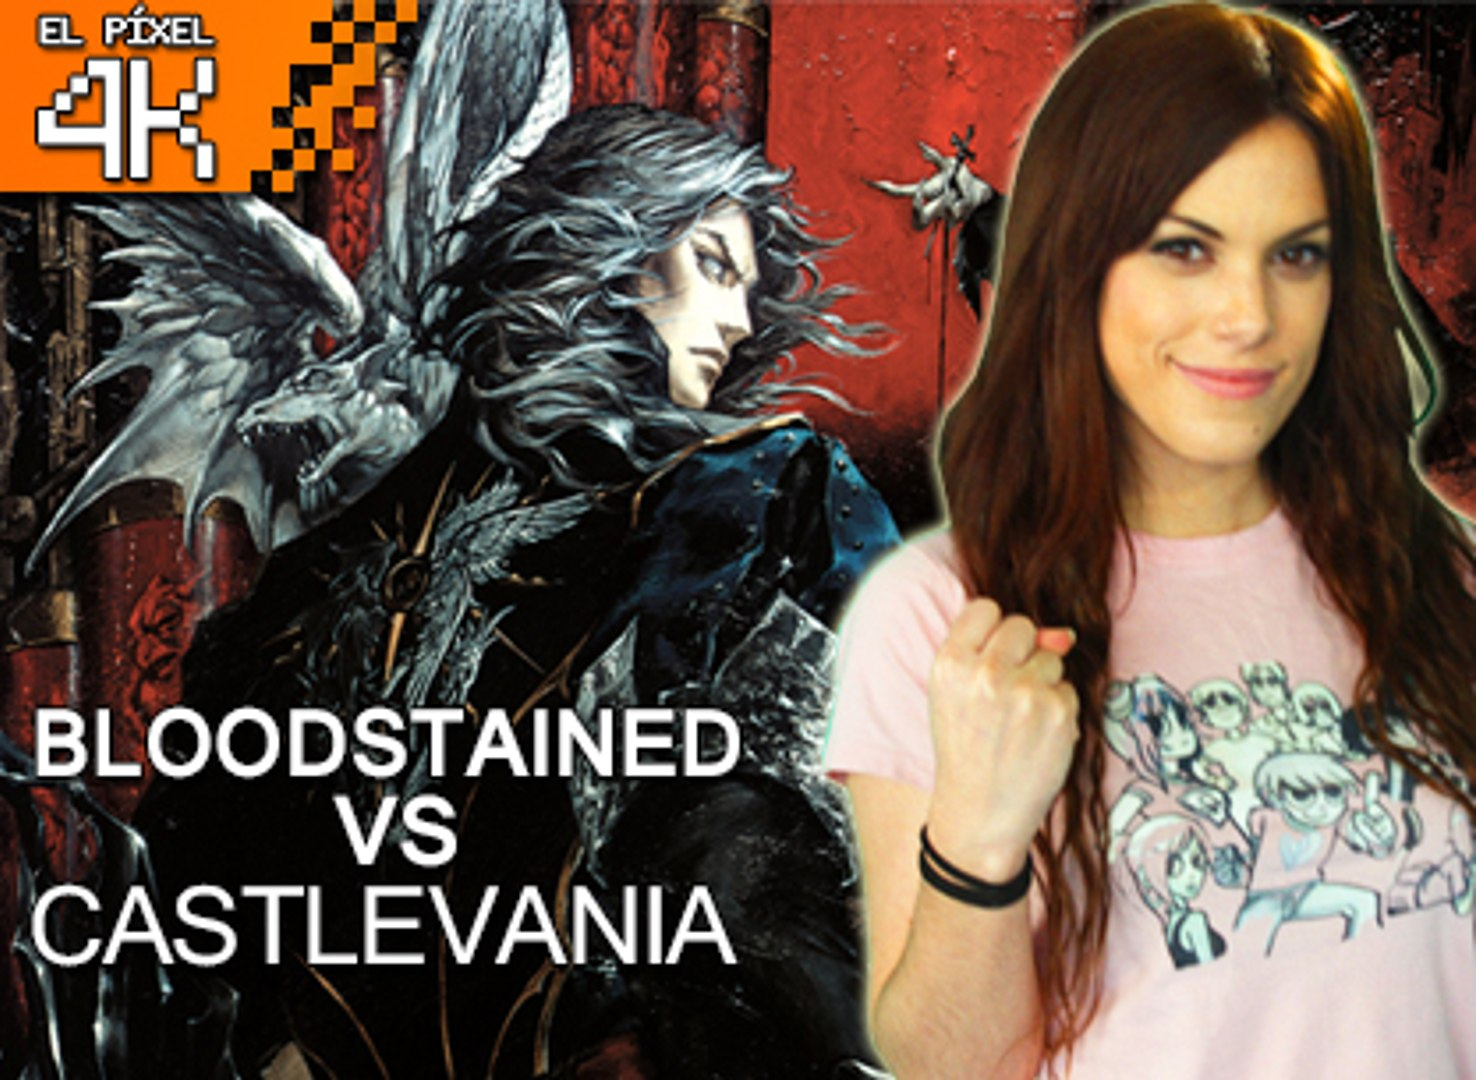 El Píxel 4K: Castlevania VS Bloodstained